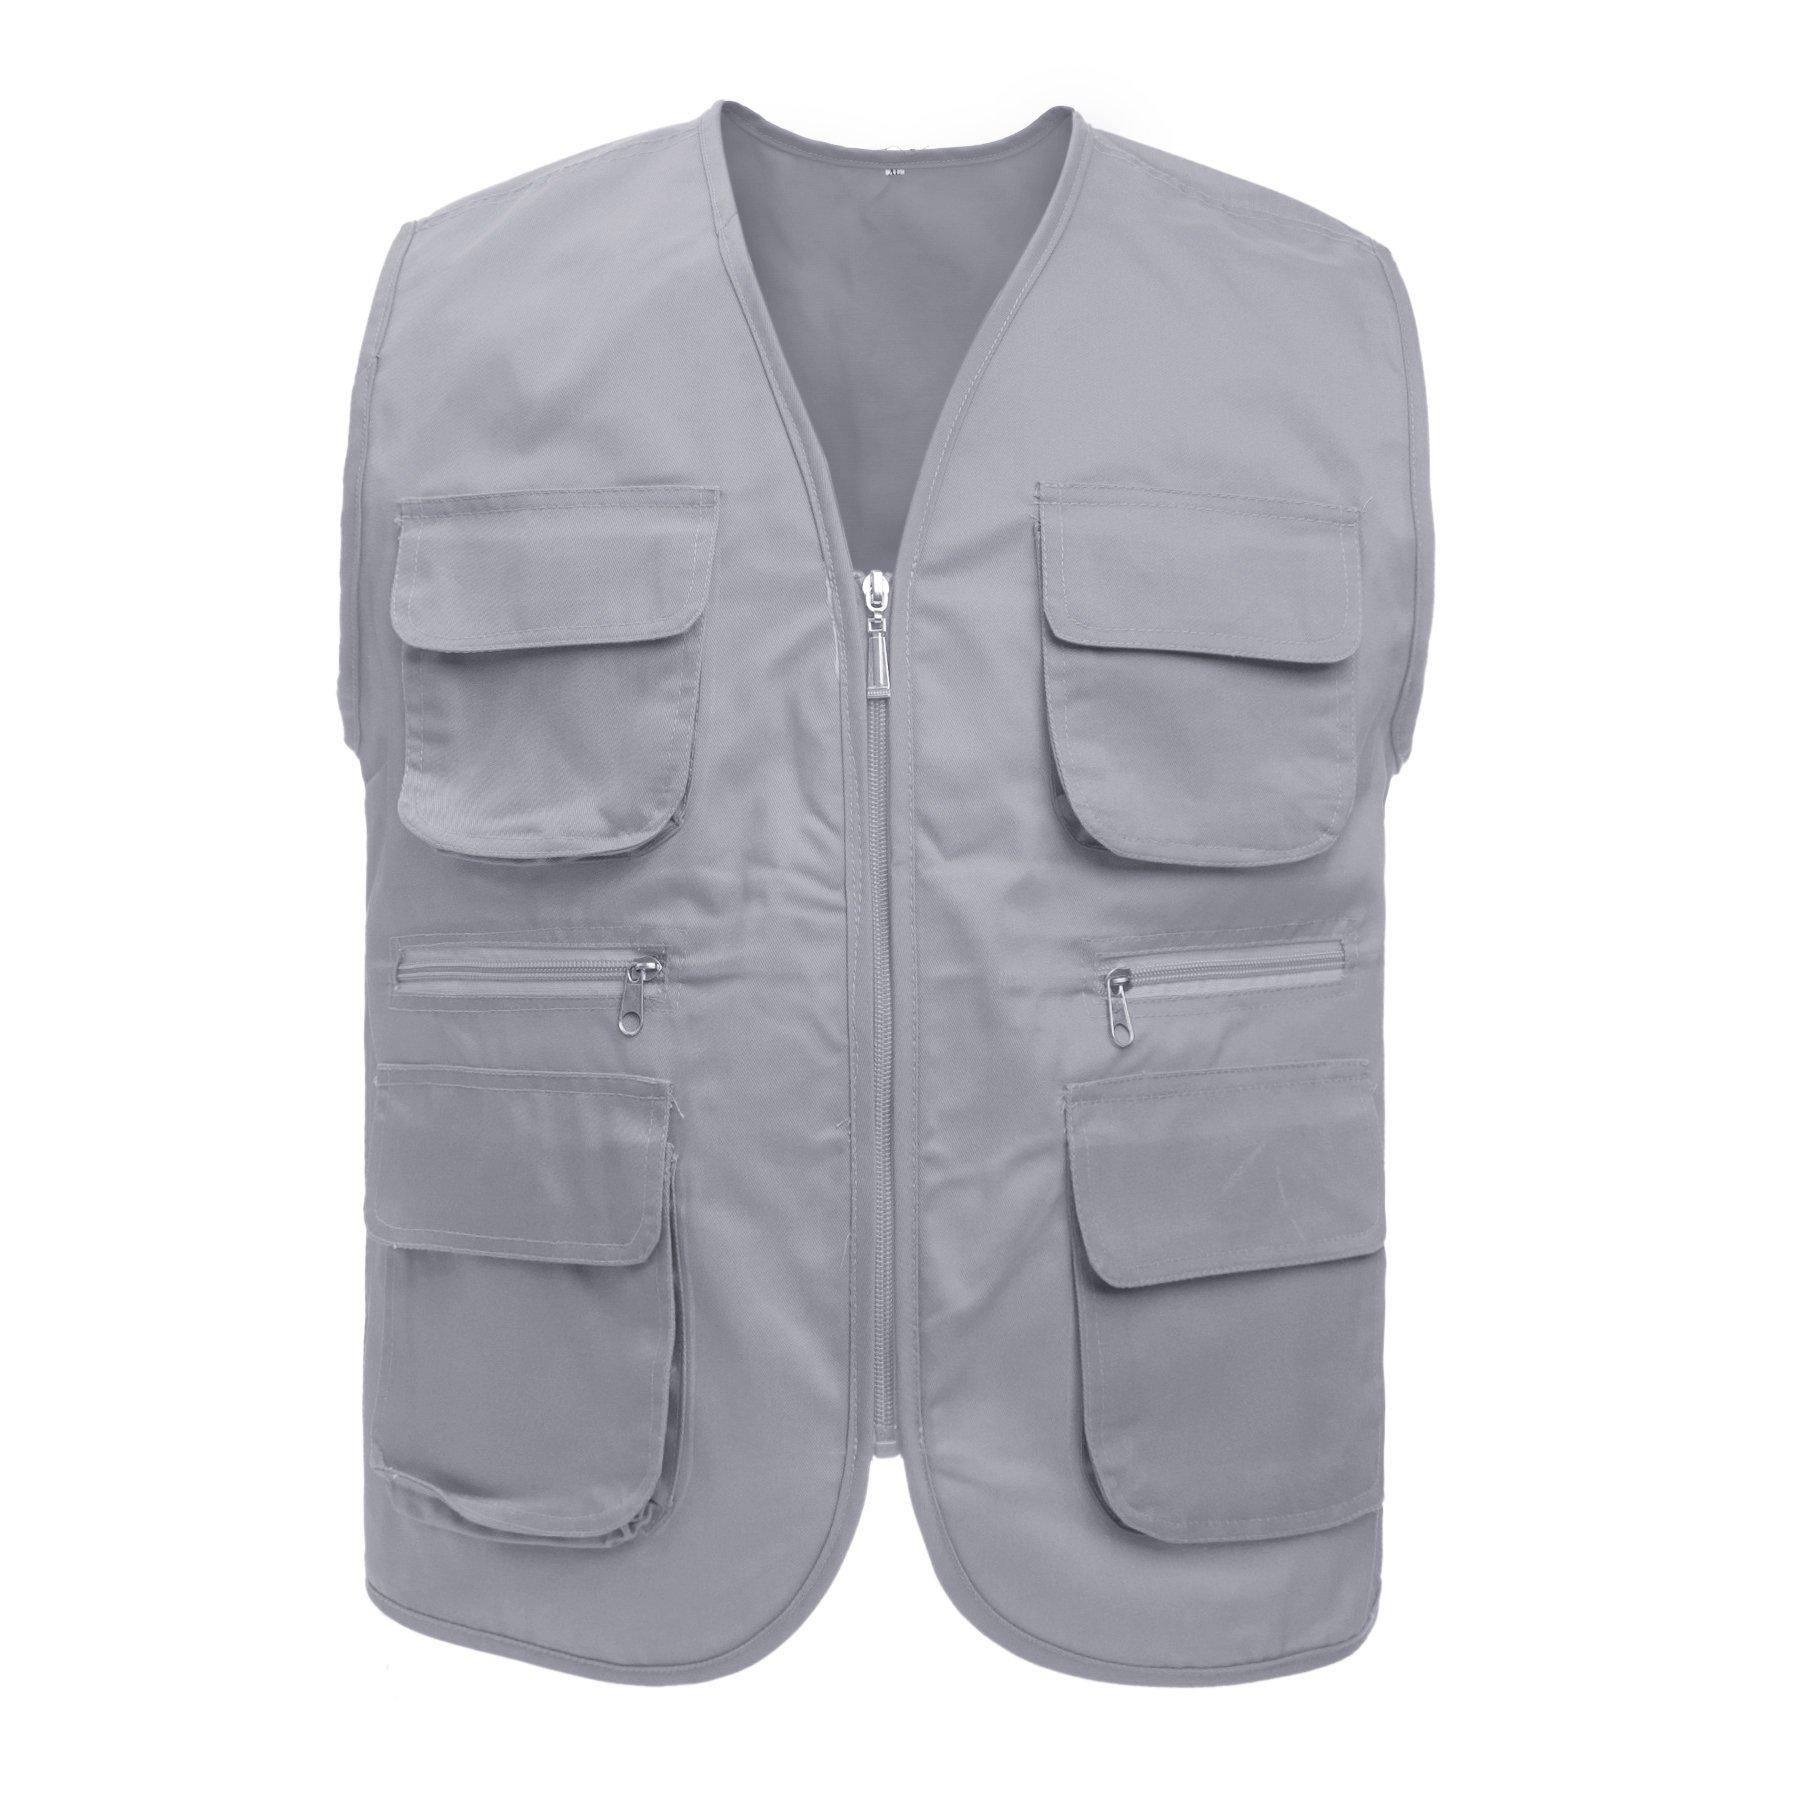 TopTie Adult Supermarket Volunteer Activity Vest Multi-Pocket Waistcoat, Gray